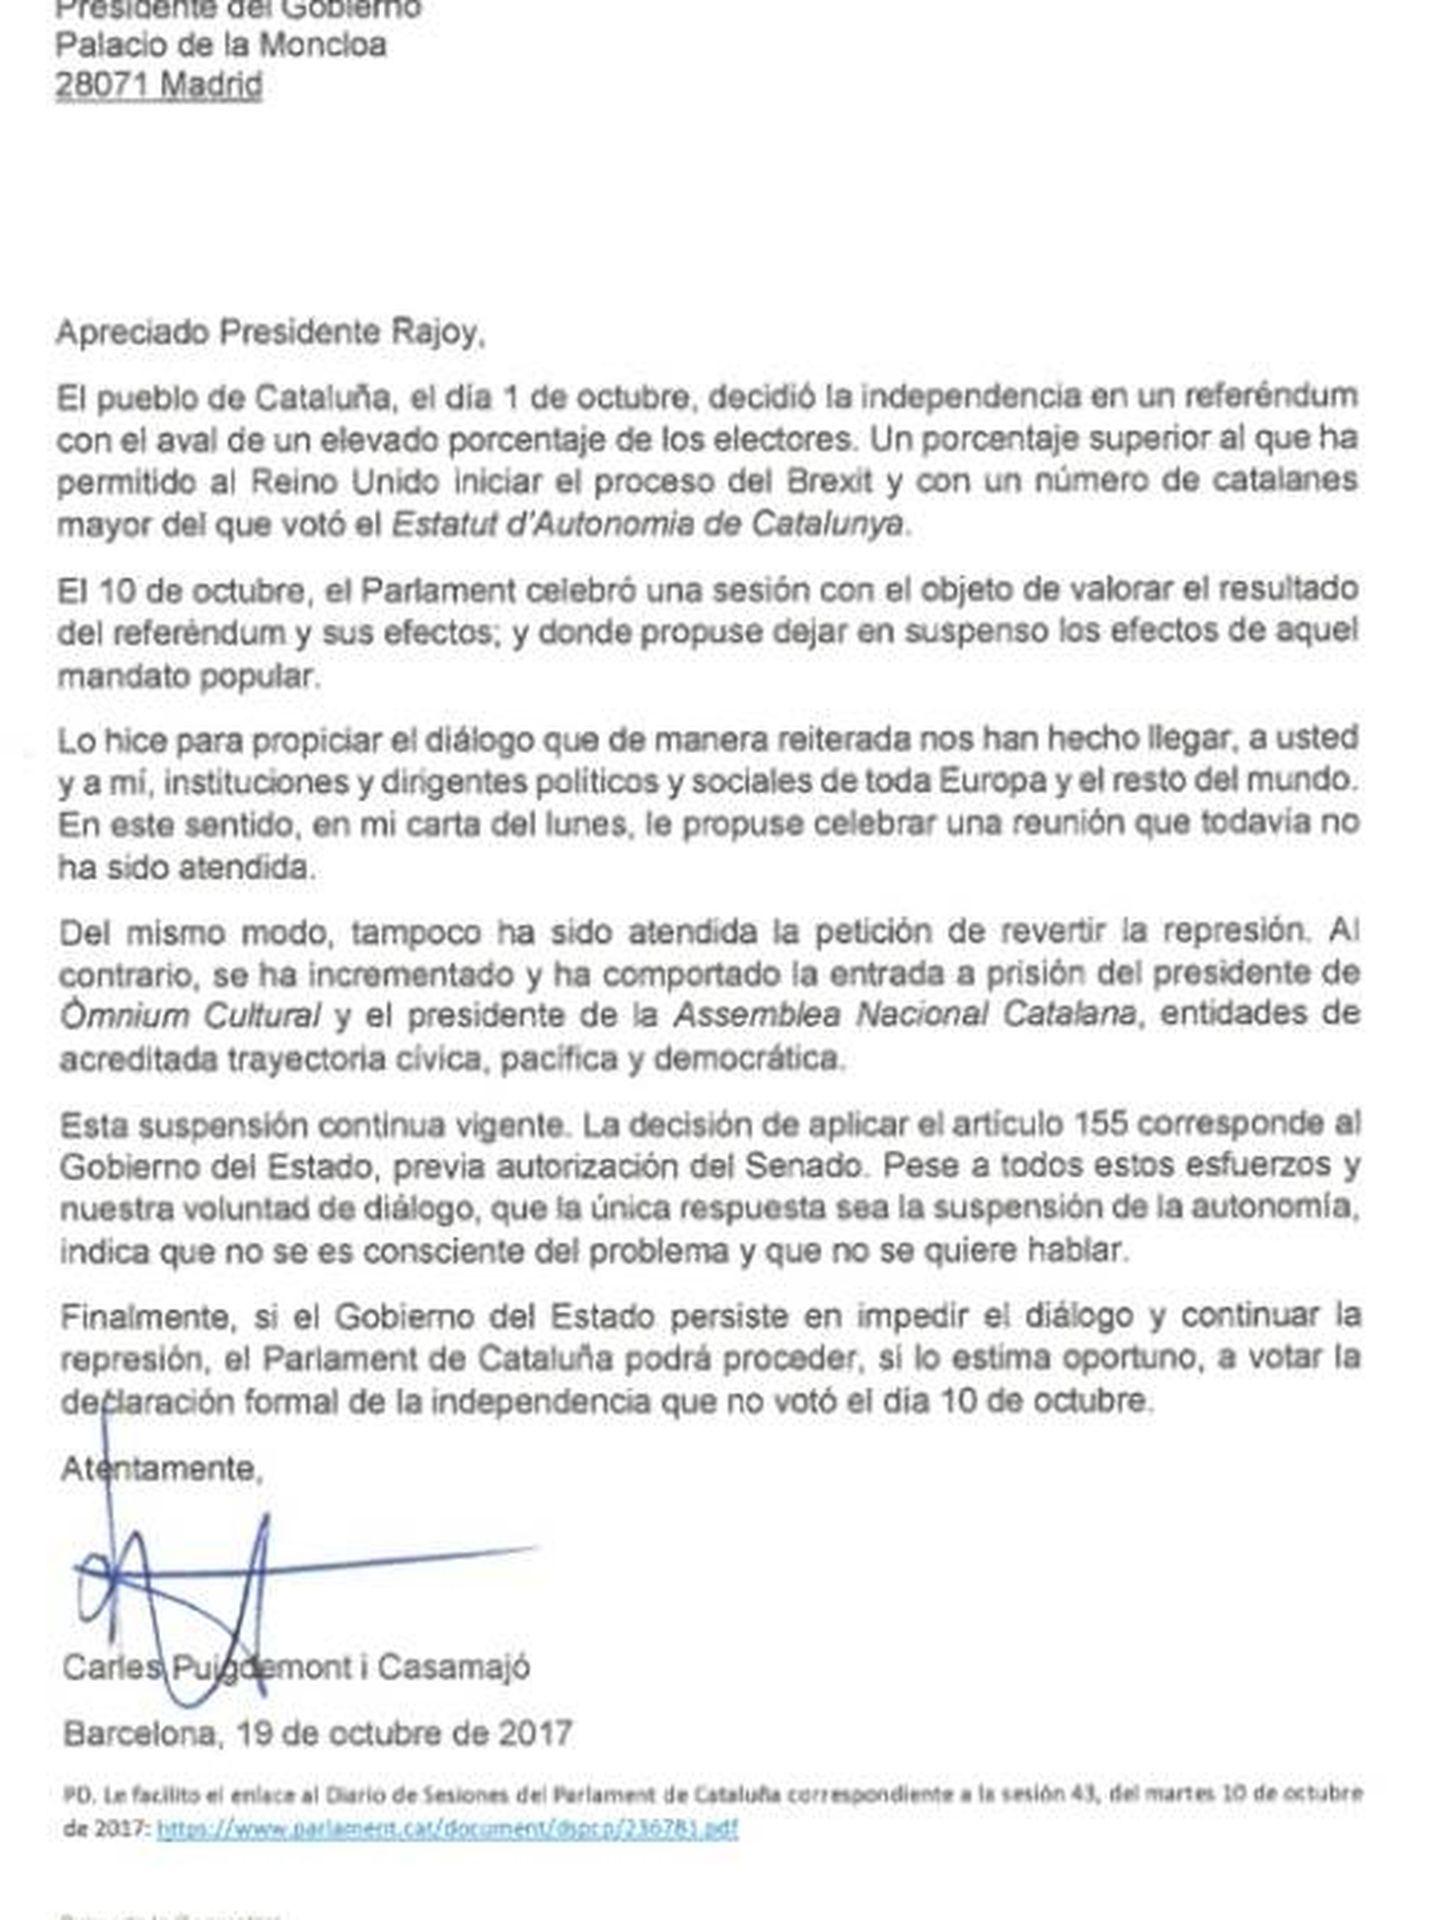 Carta de Puigdemont a Mariano Rajoy